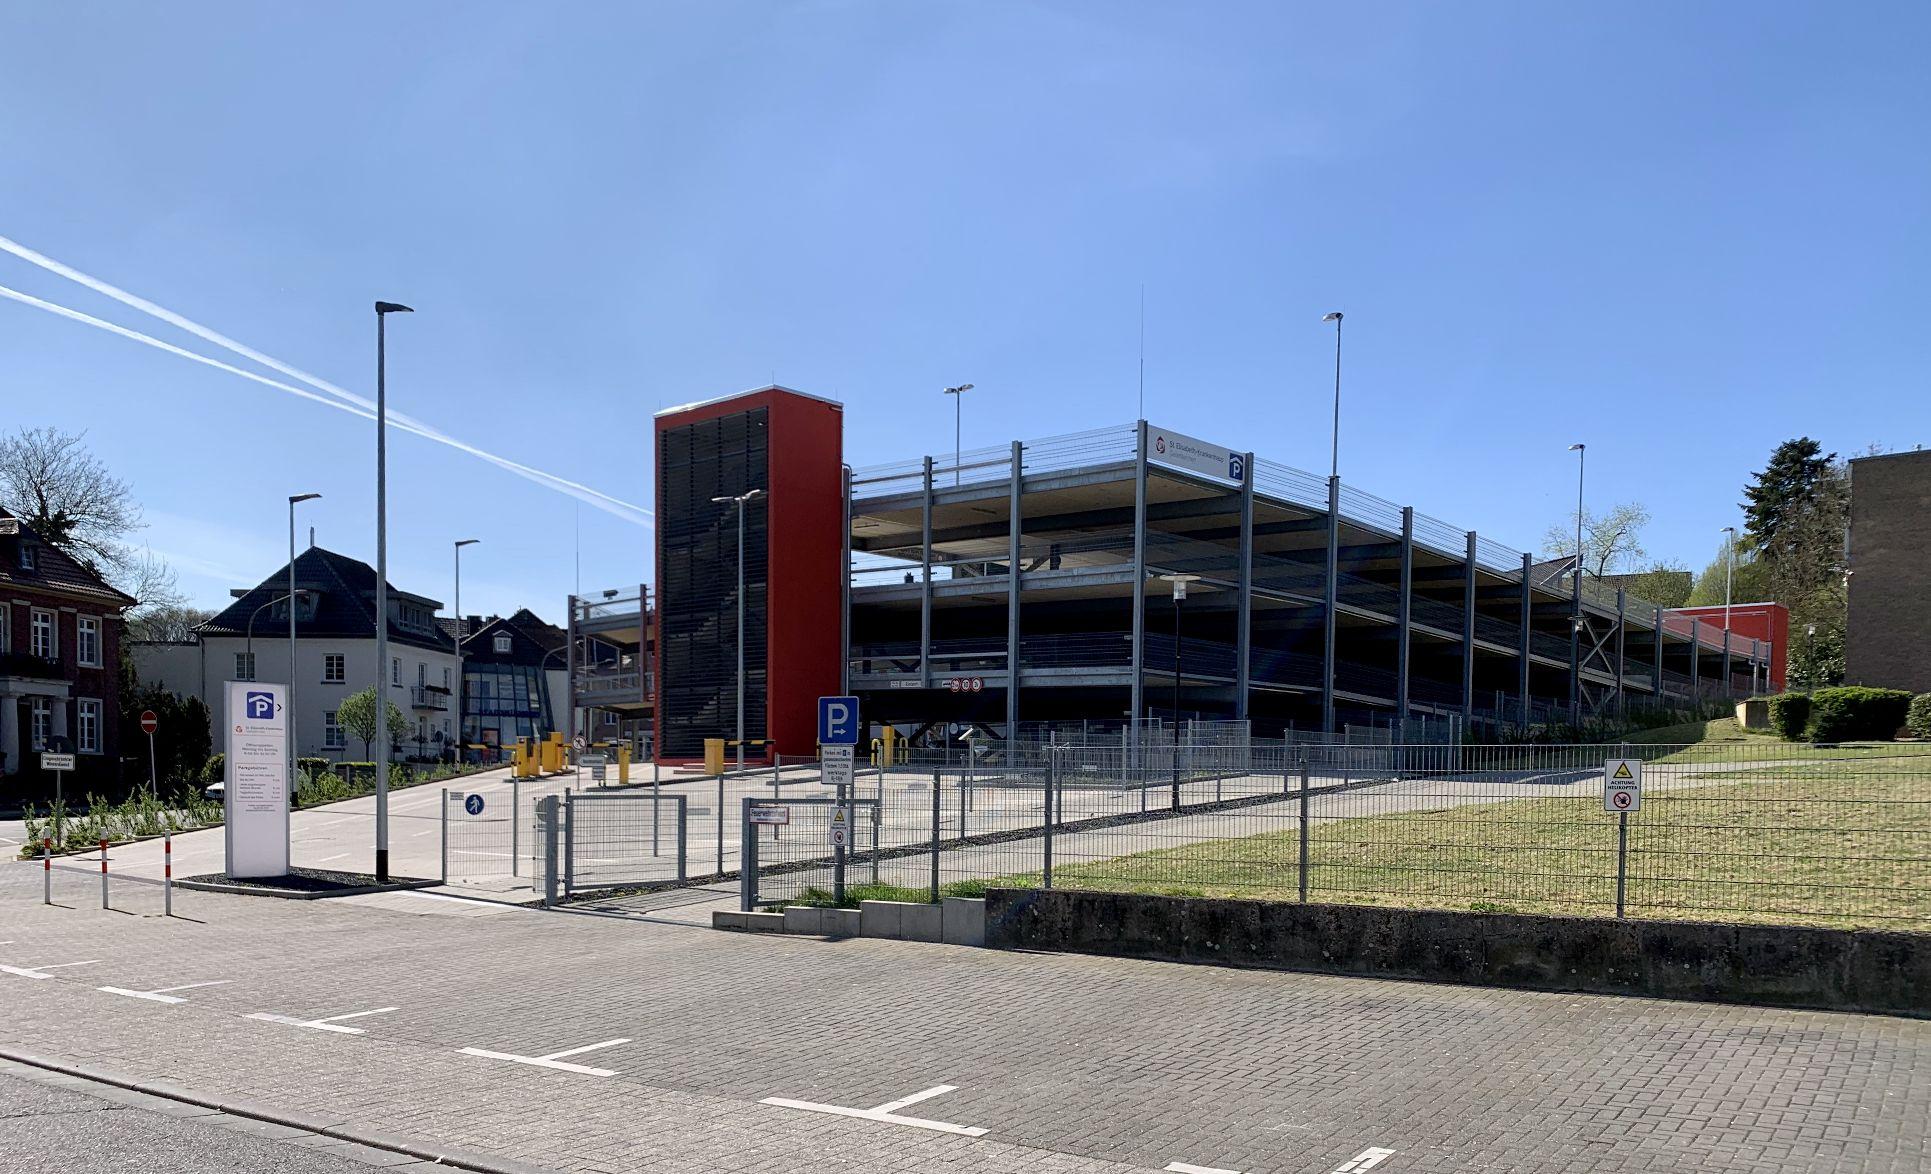 Neubau eines Parkhauses